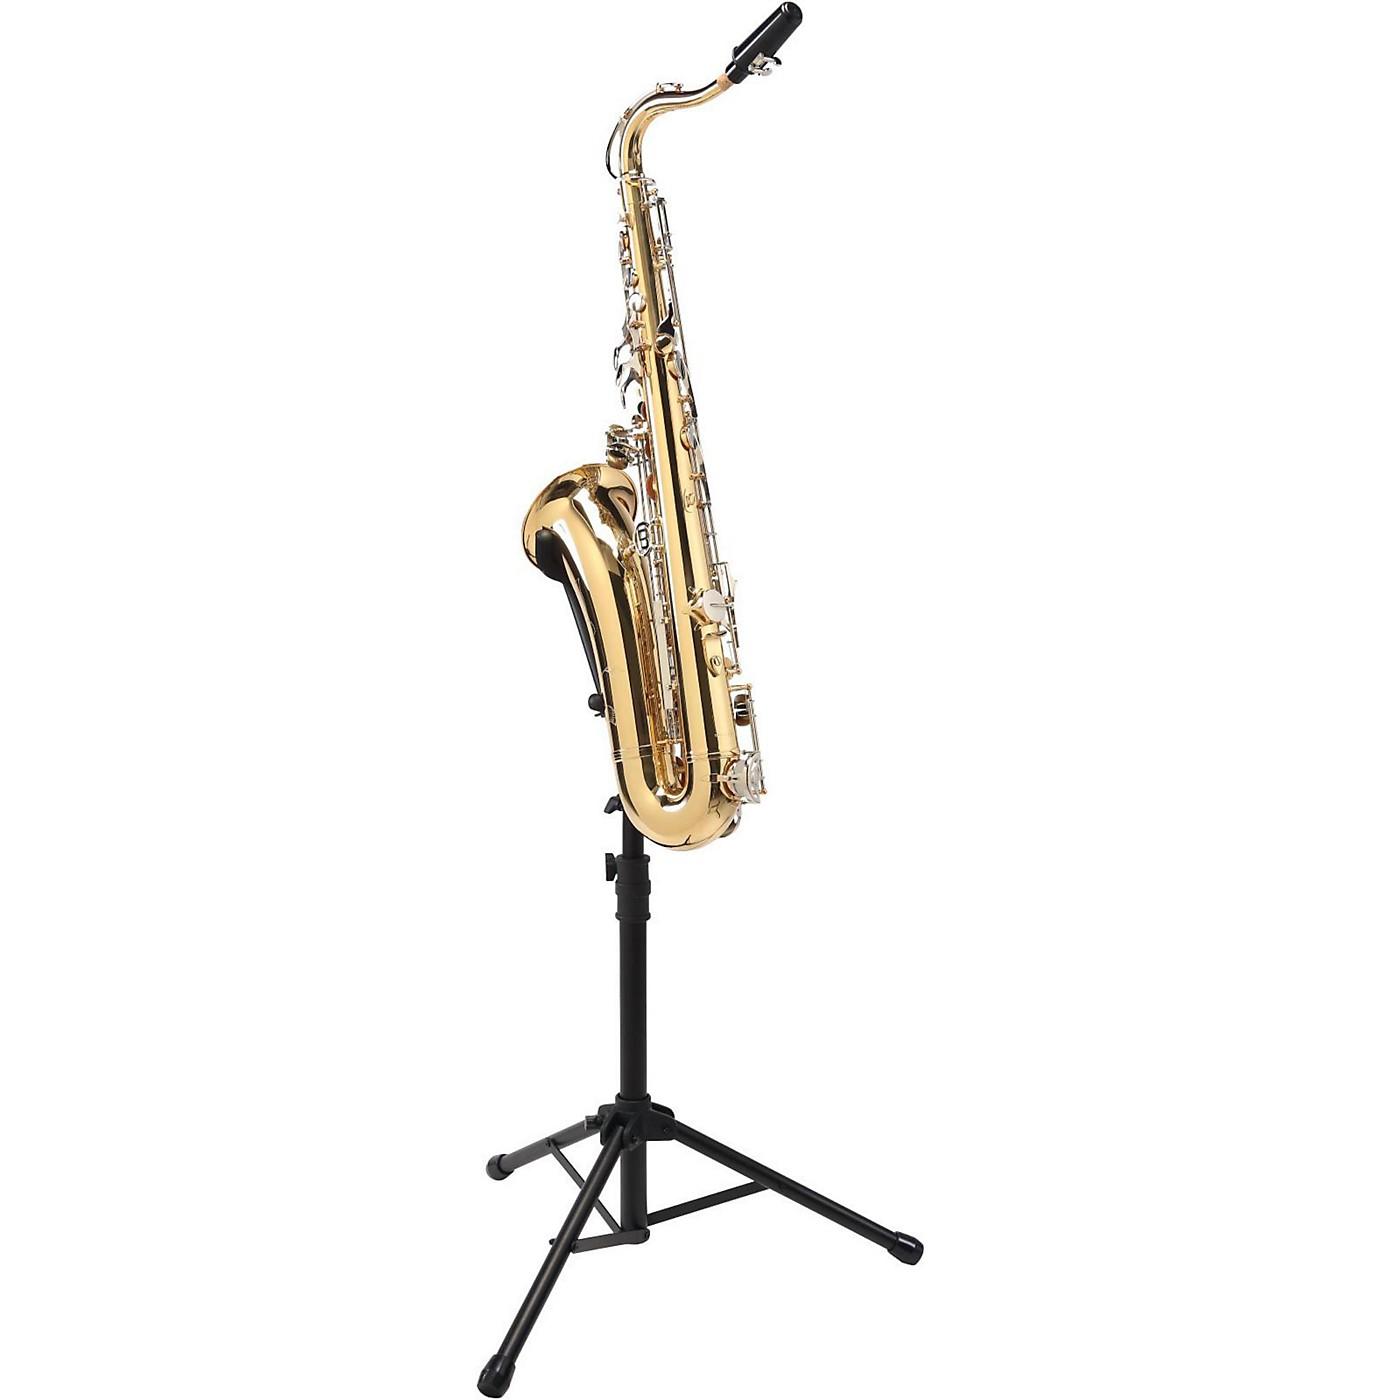 Titan Folding Alto or Tenor Saxophone Tall Standing Stand thumbnail